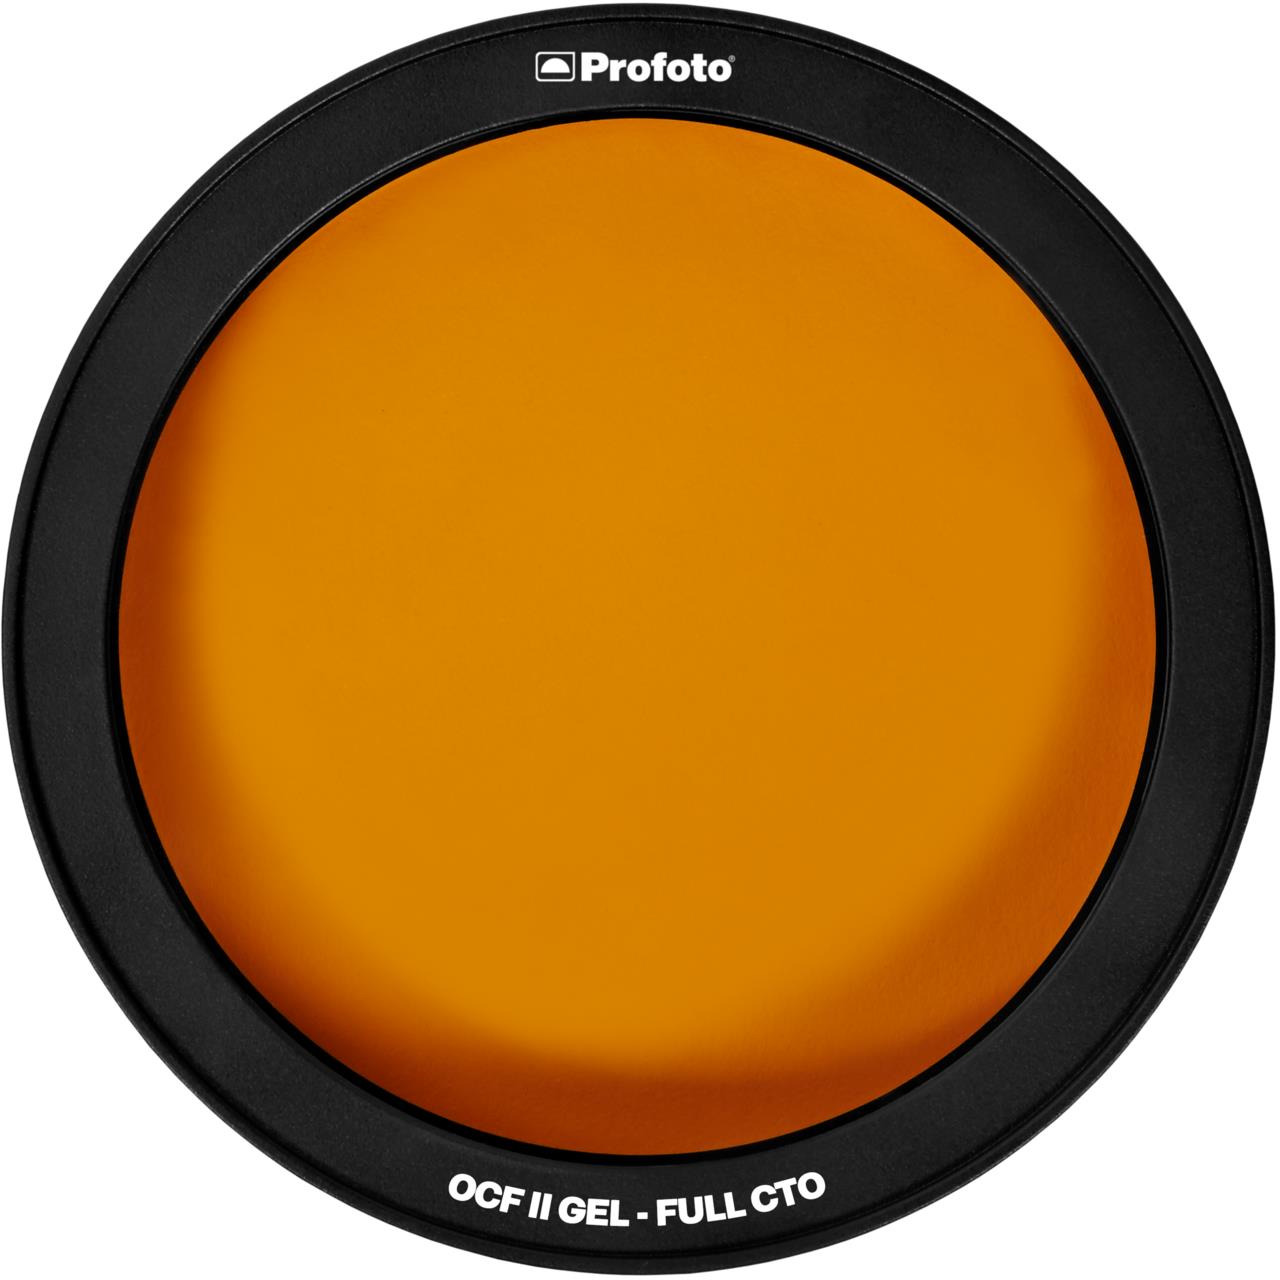 Profoto OCF II Gel - Full CTO